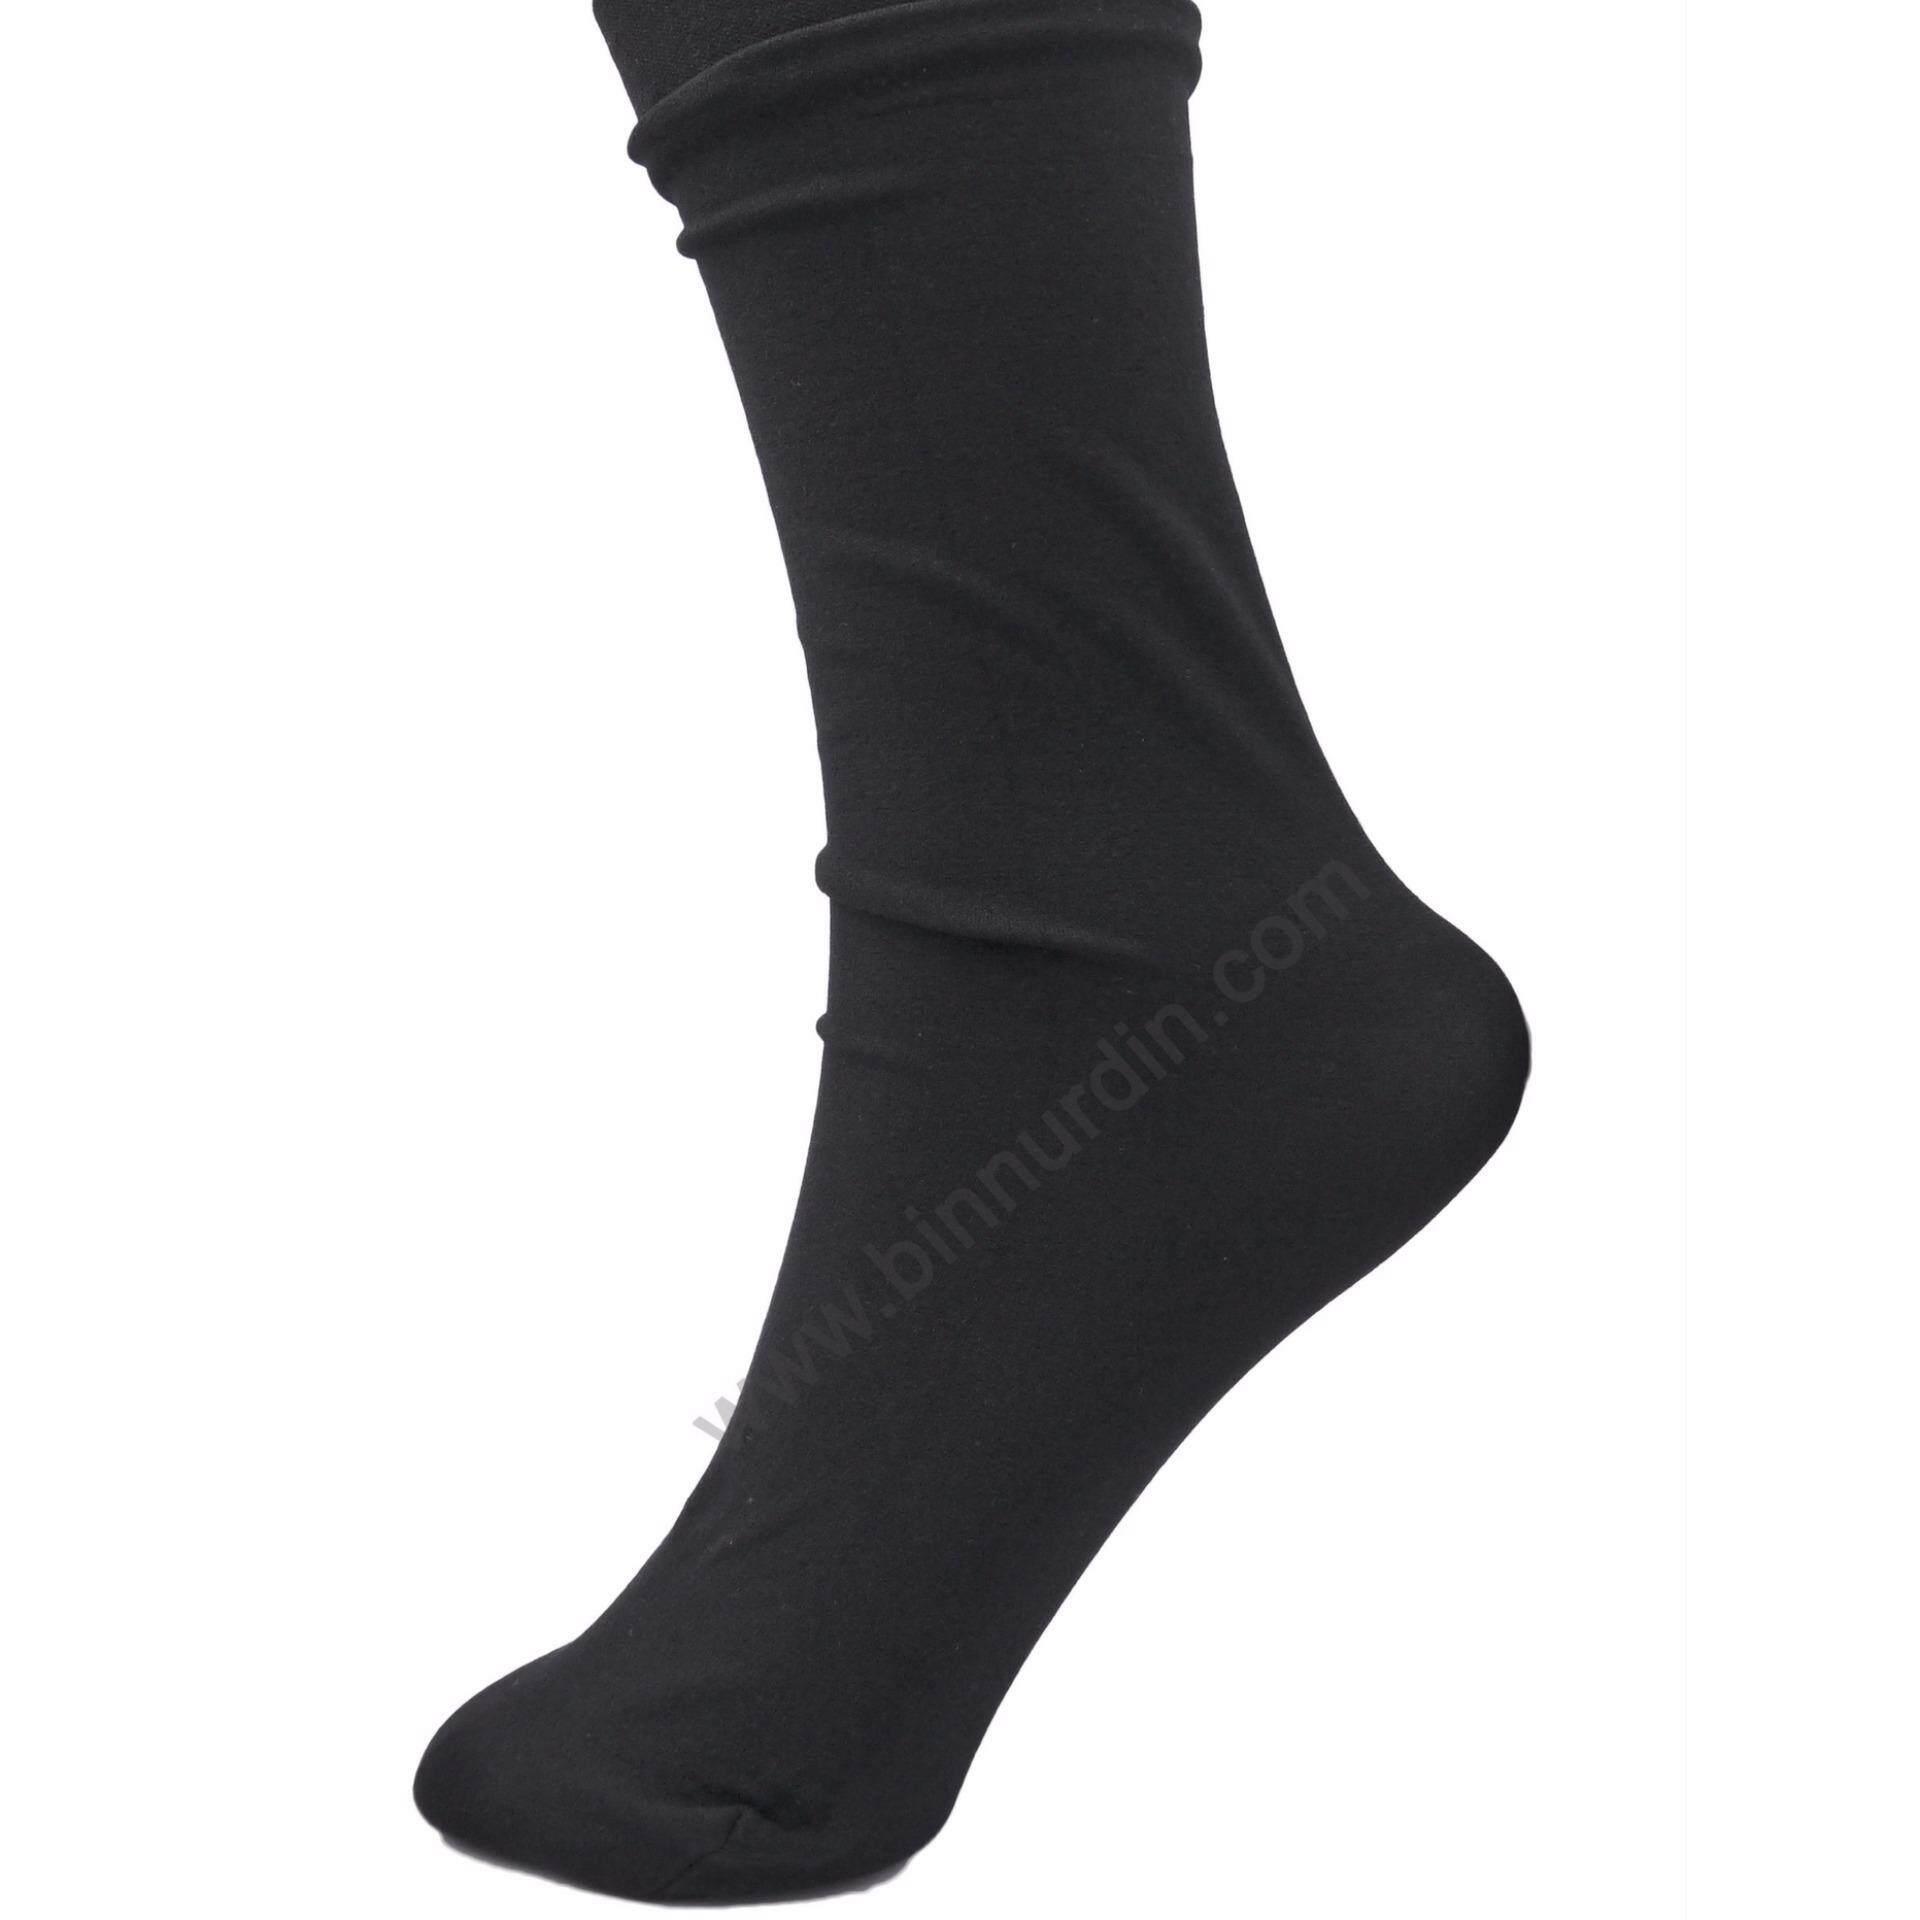 Aurat Stocking Knee Hi Black